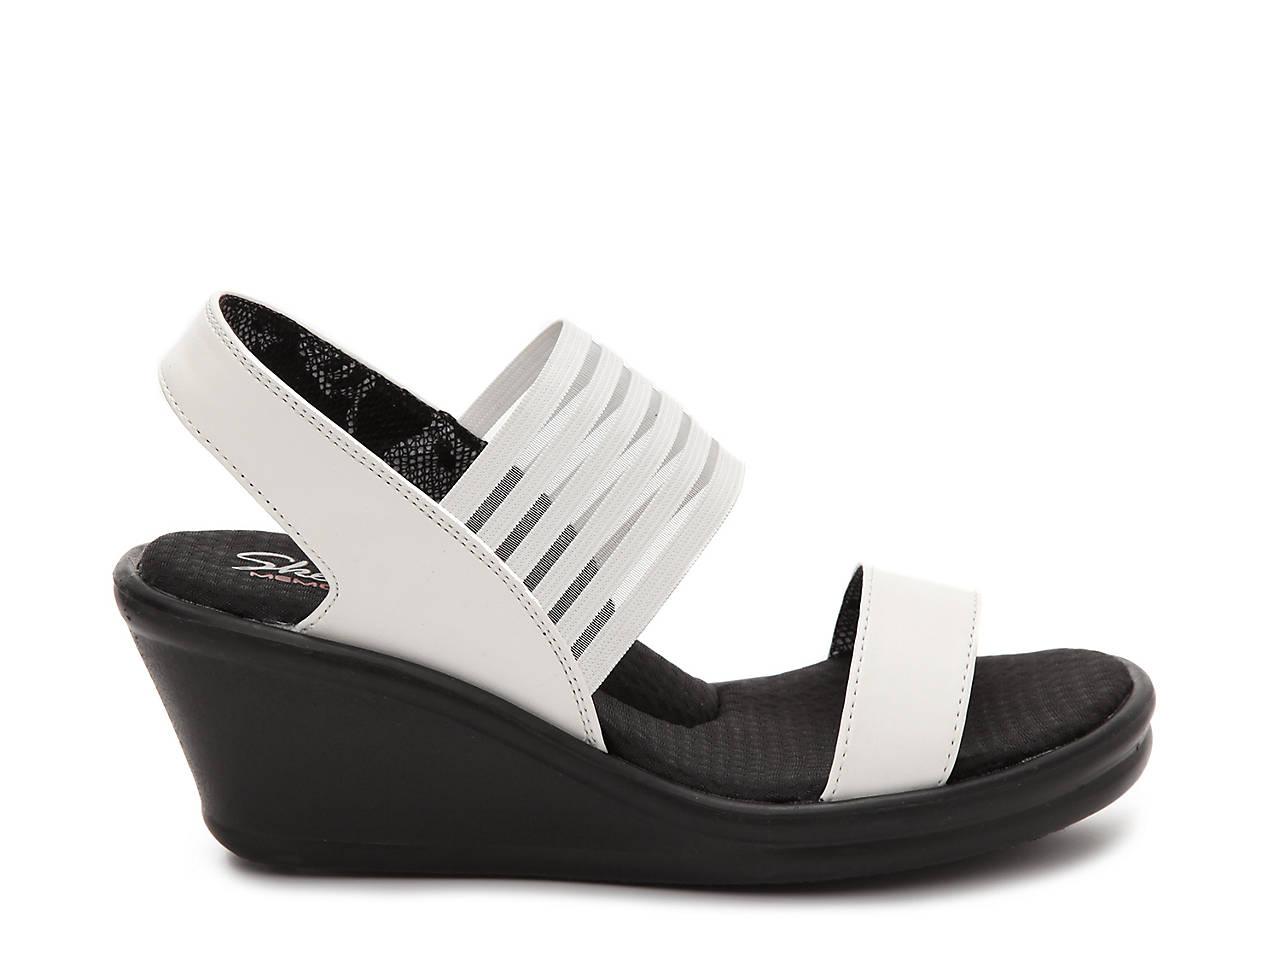 ddc8ccf7e54 Skechers Cali Sci-Fi Wedge Sandal Women s Shoes